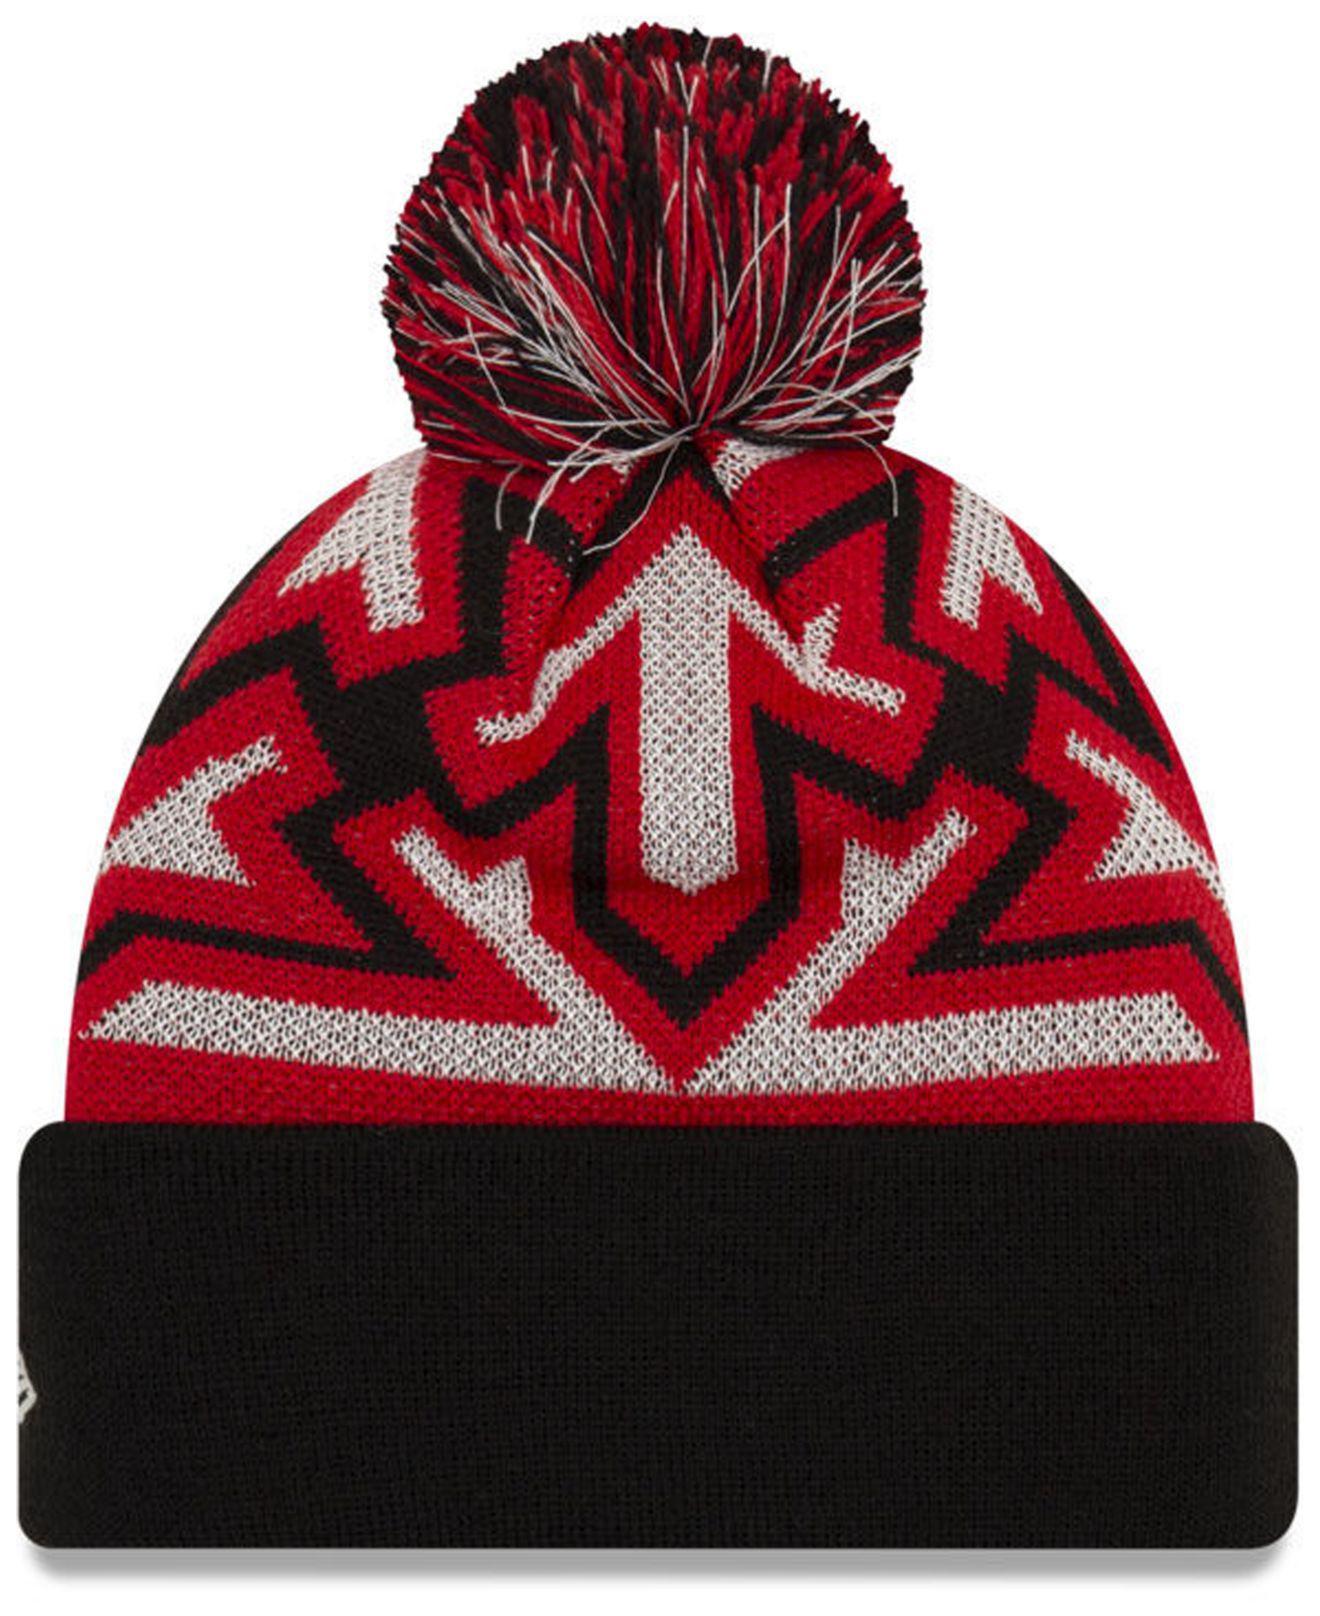 dc1307433cb Lyst - KTZ Chicago Bulls Glowflake Cuff Knit Hat in Red for Men